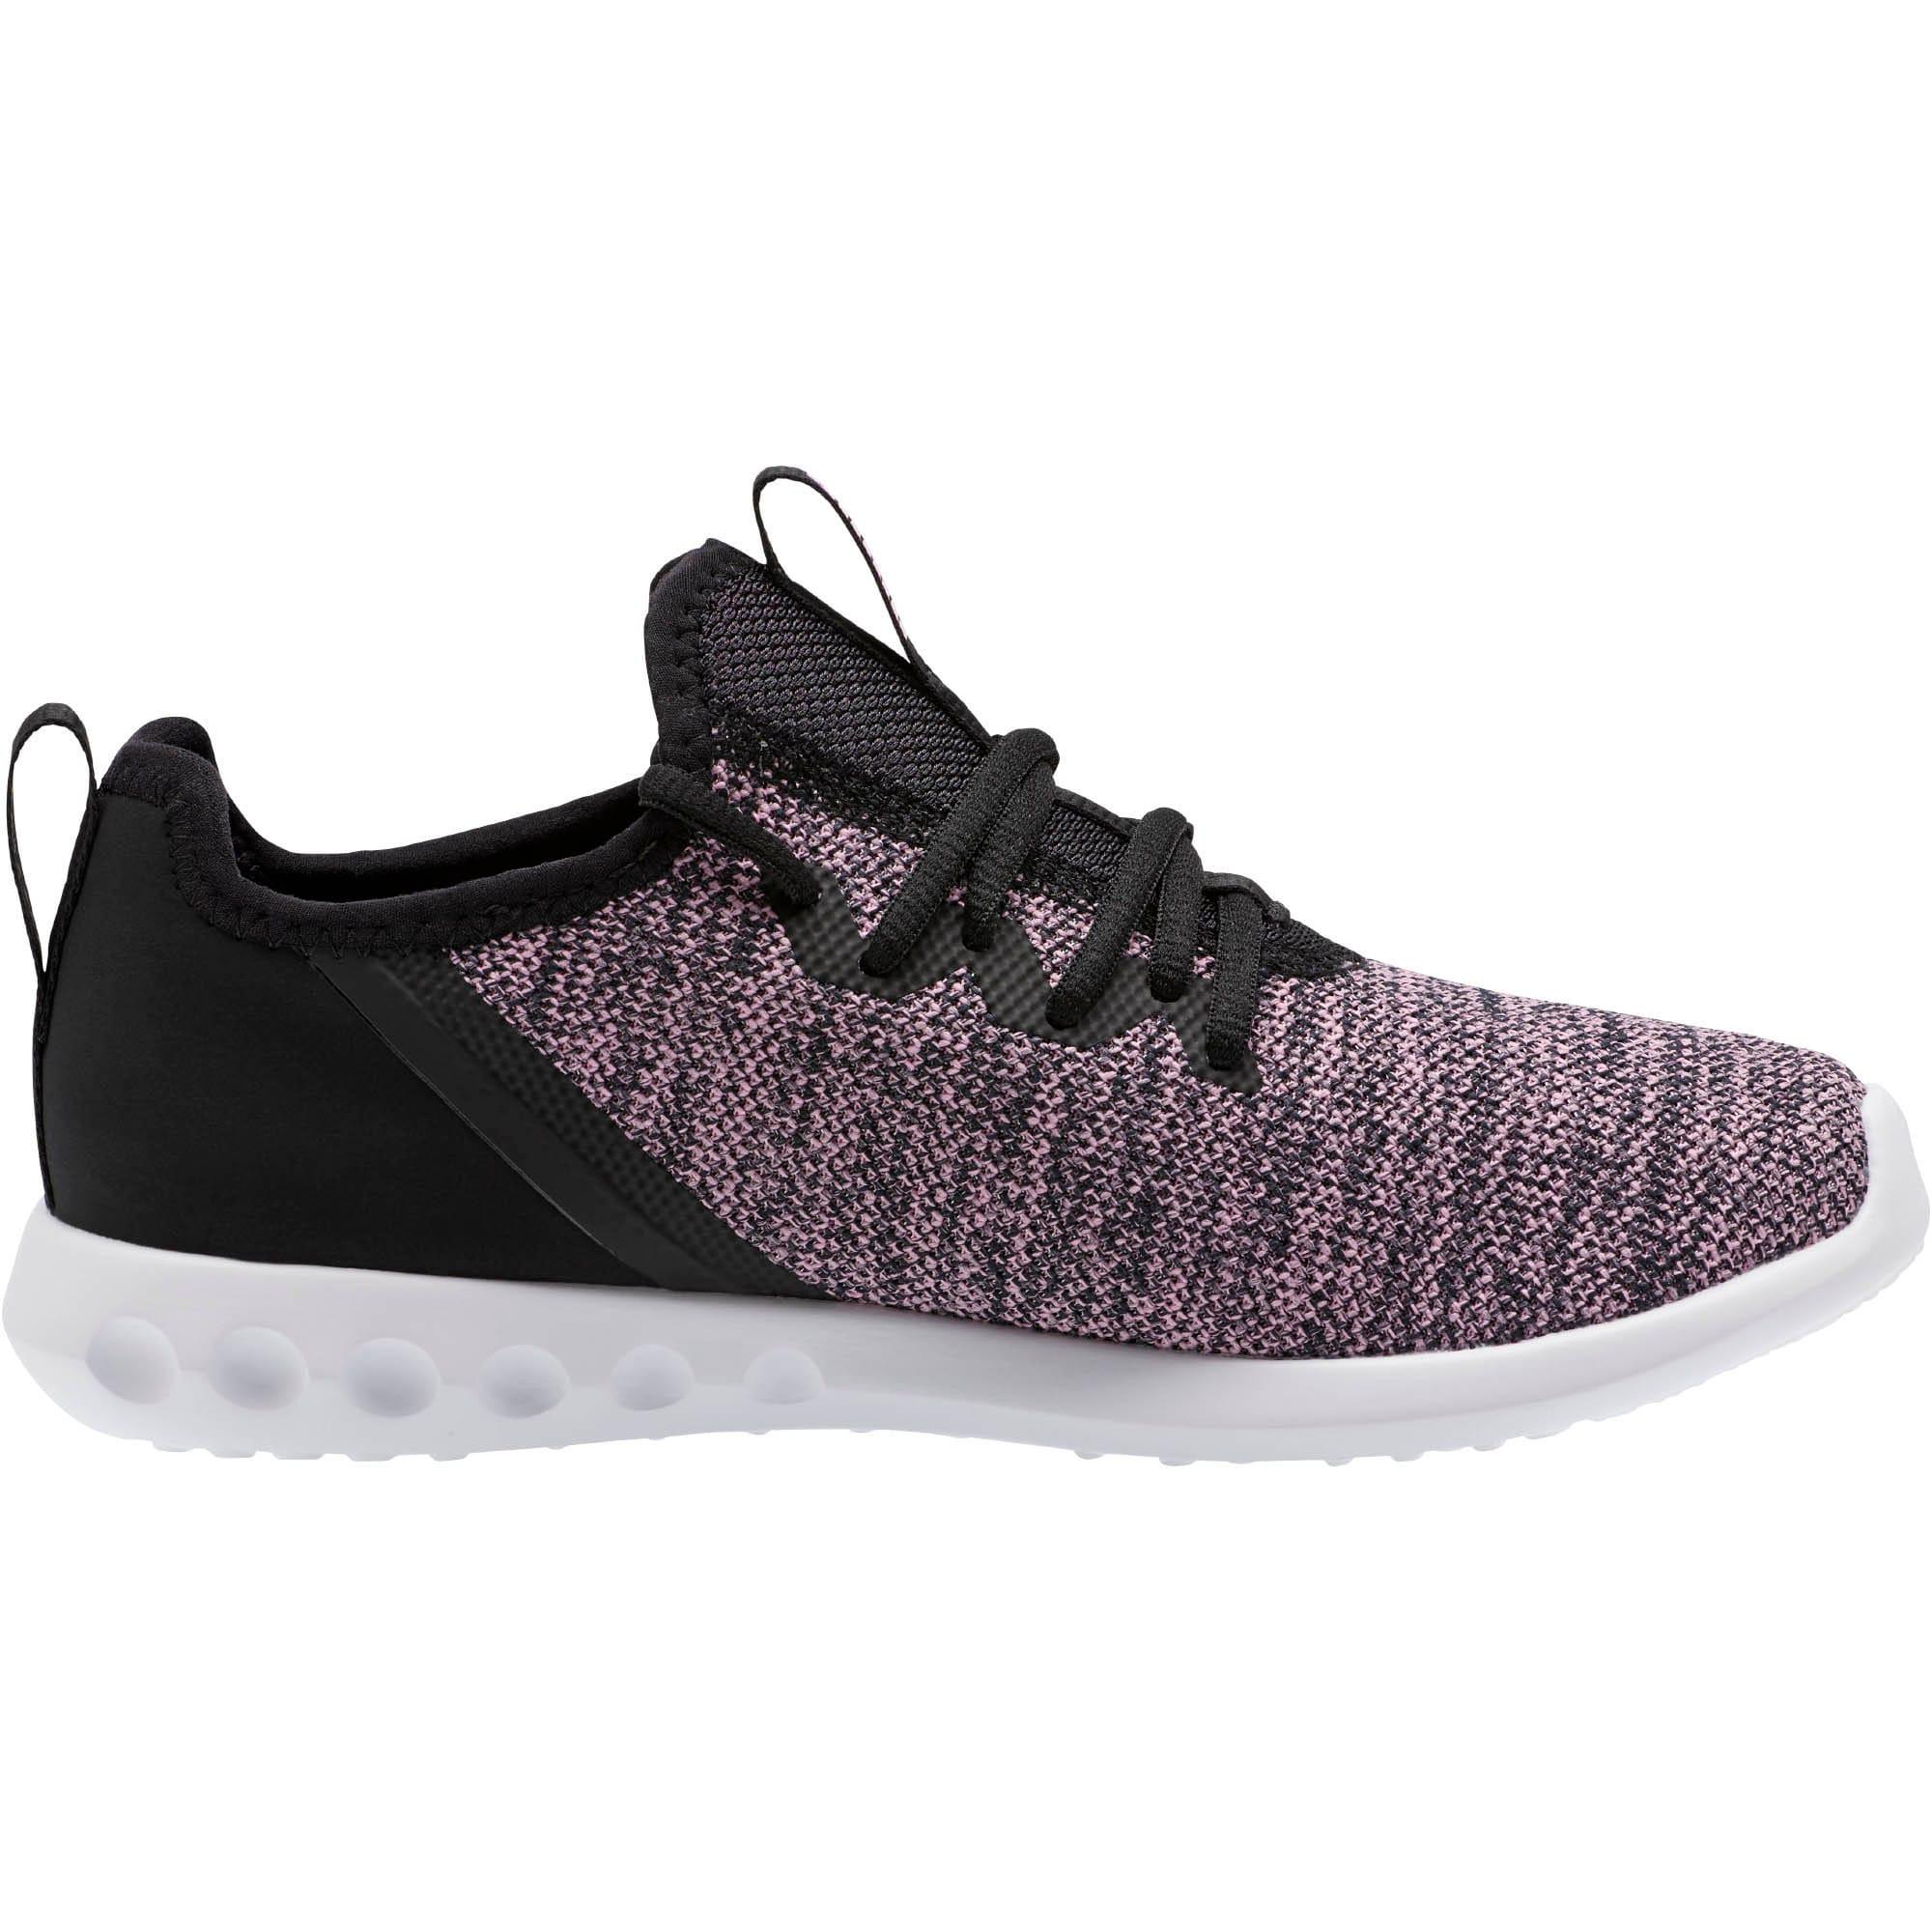 Thumbnail 5 of Carson 2 X Knit Women's Running Shoes, Puma Black-Orchid, medium